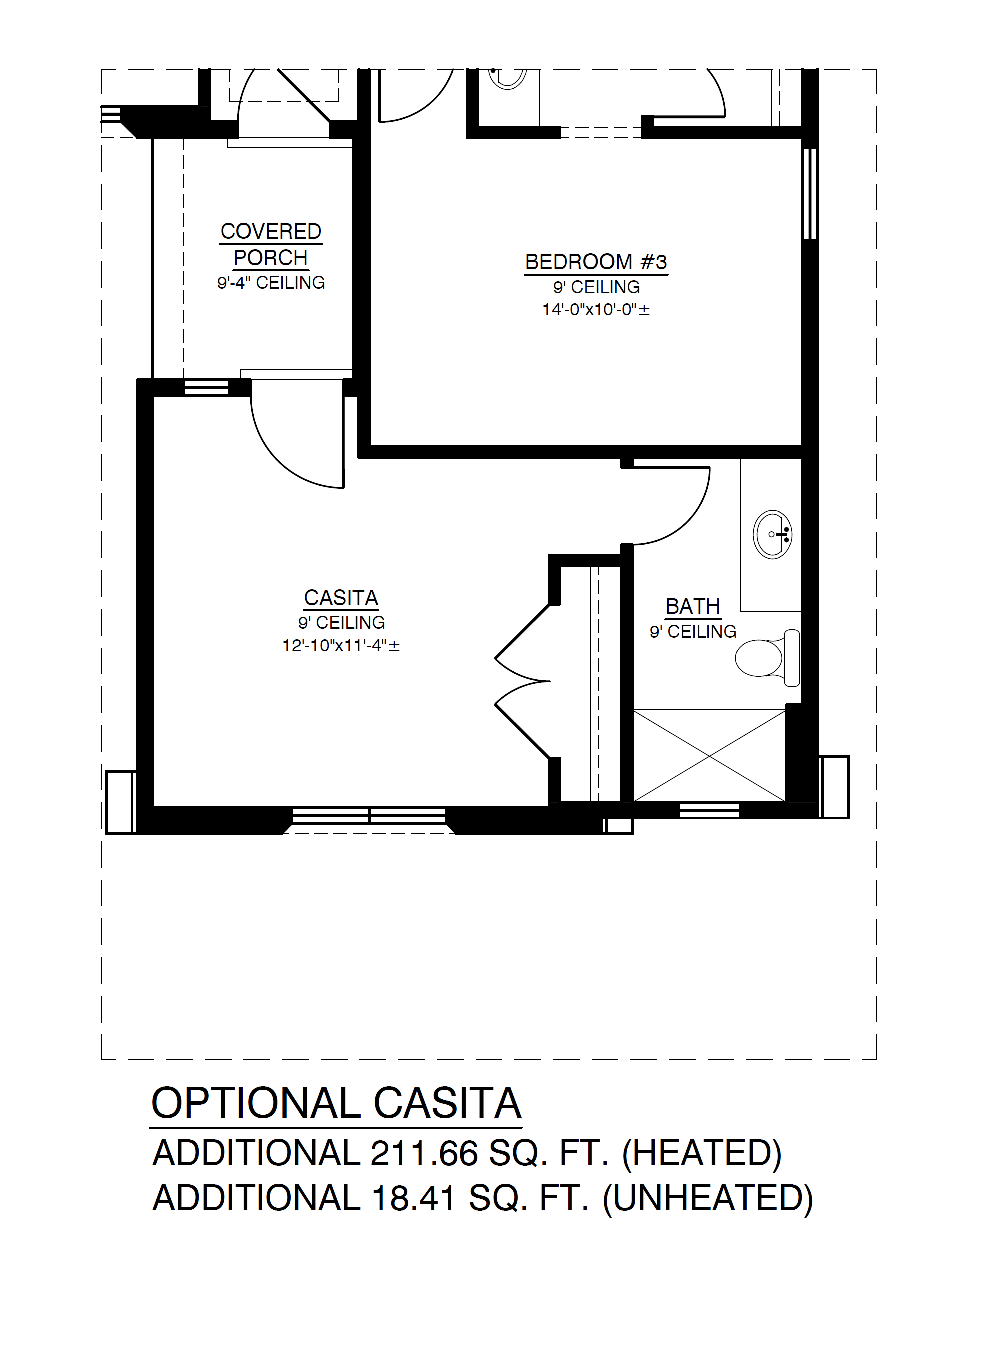 Optional Casita